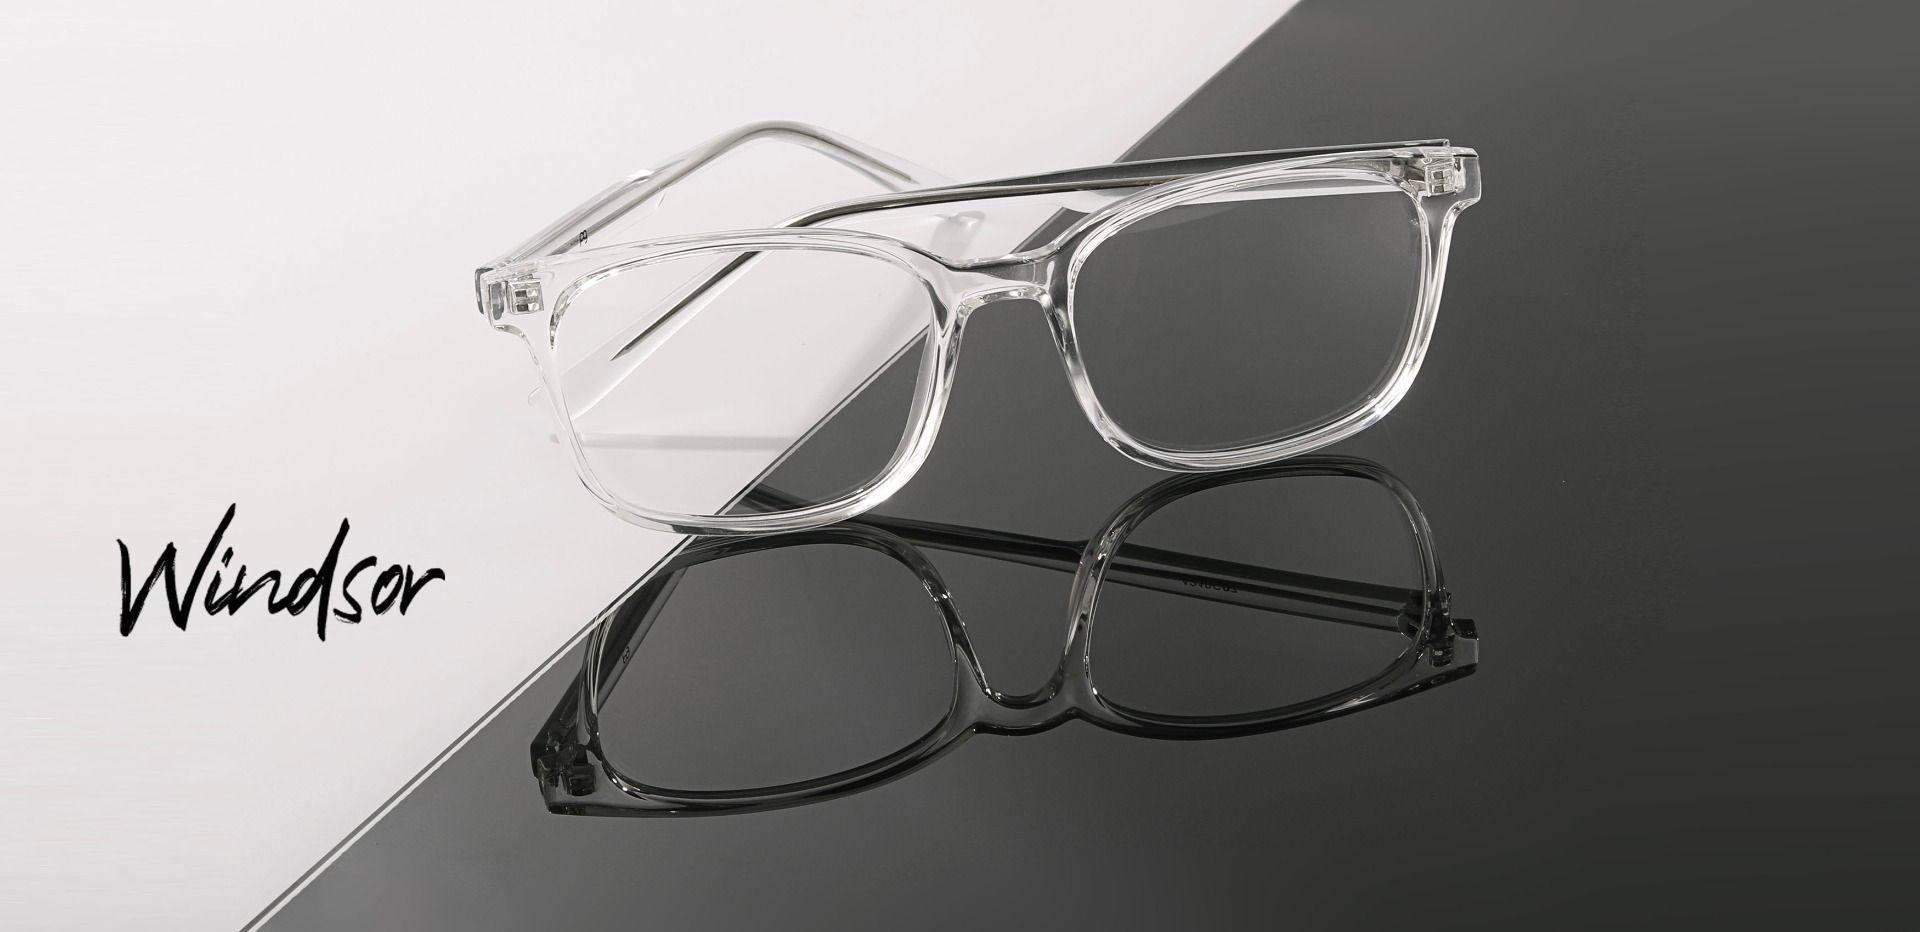 Windsor Rectangle Reading Glasses - Crystal